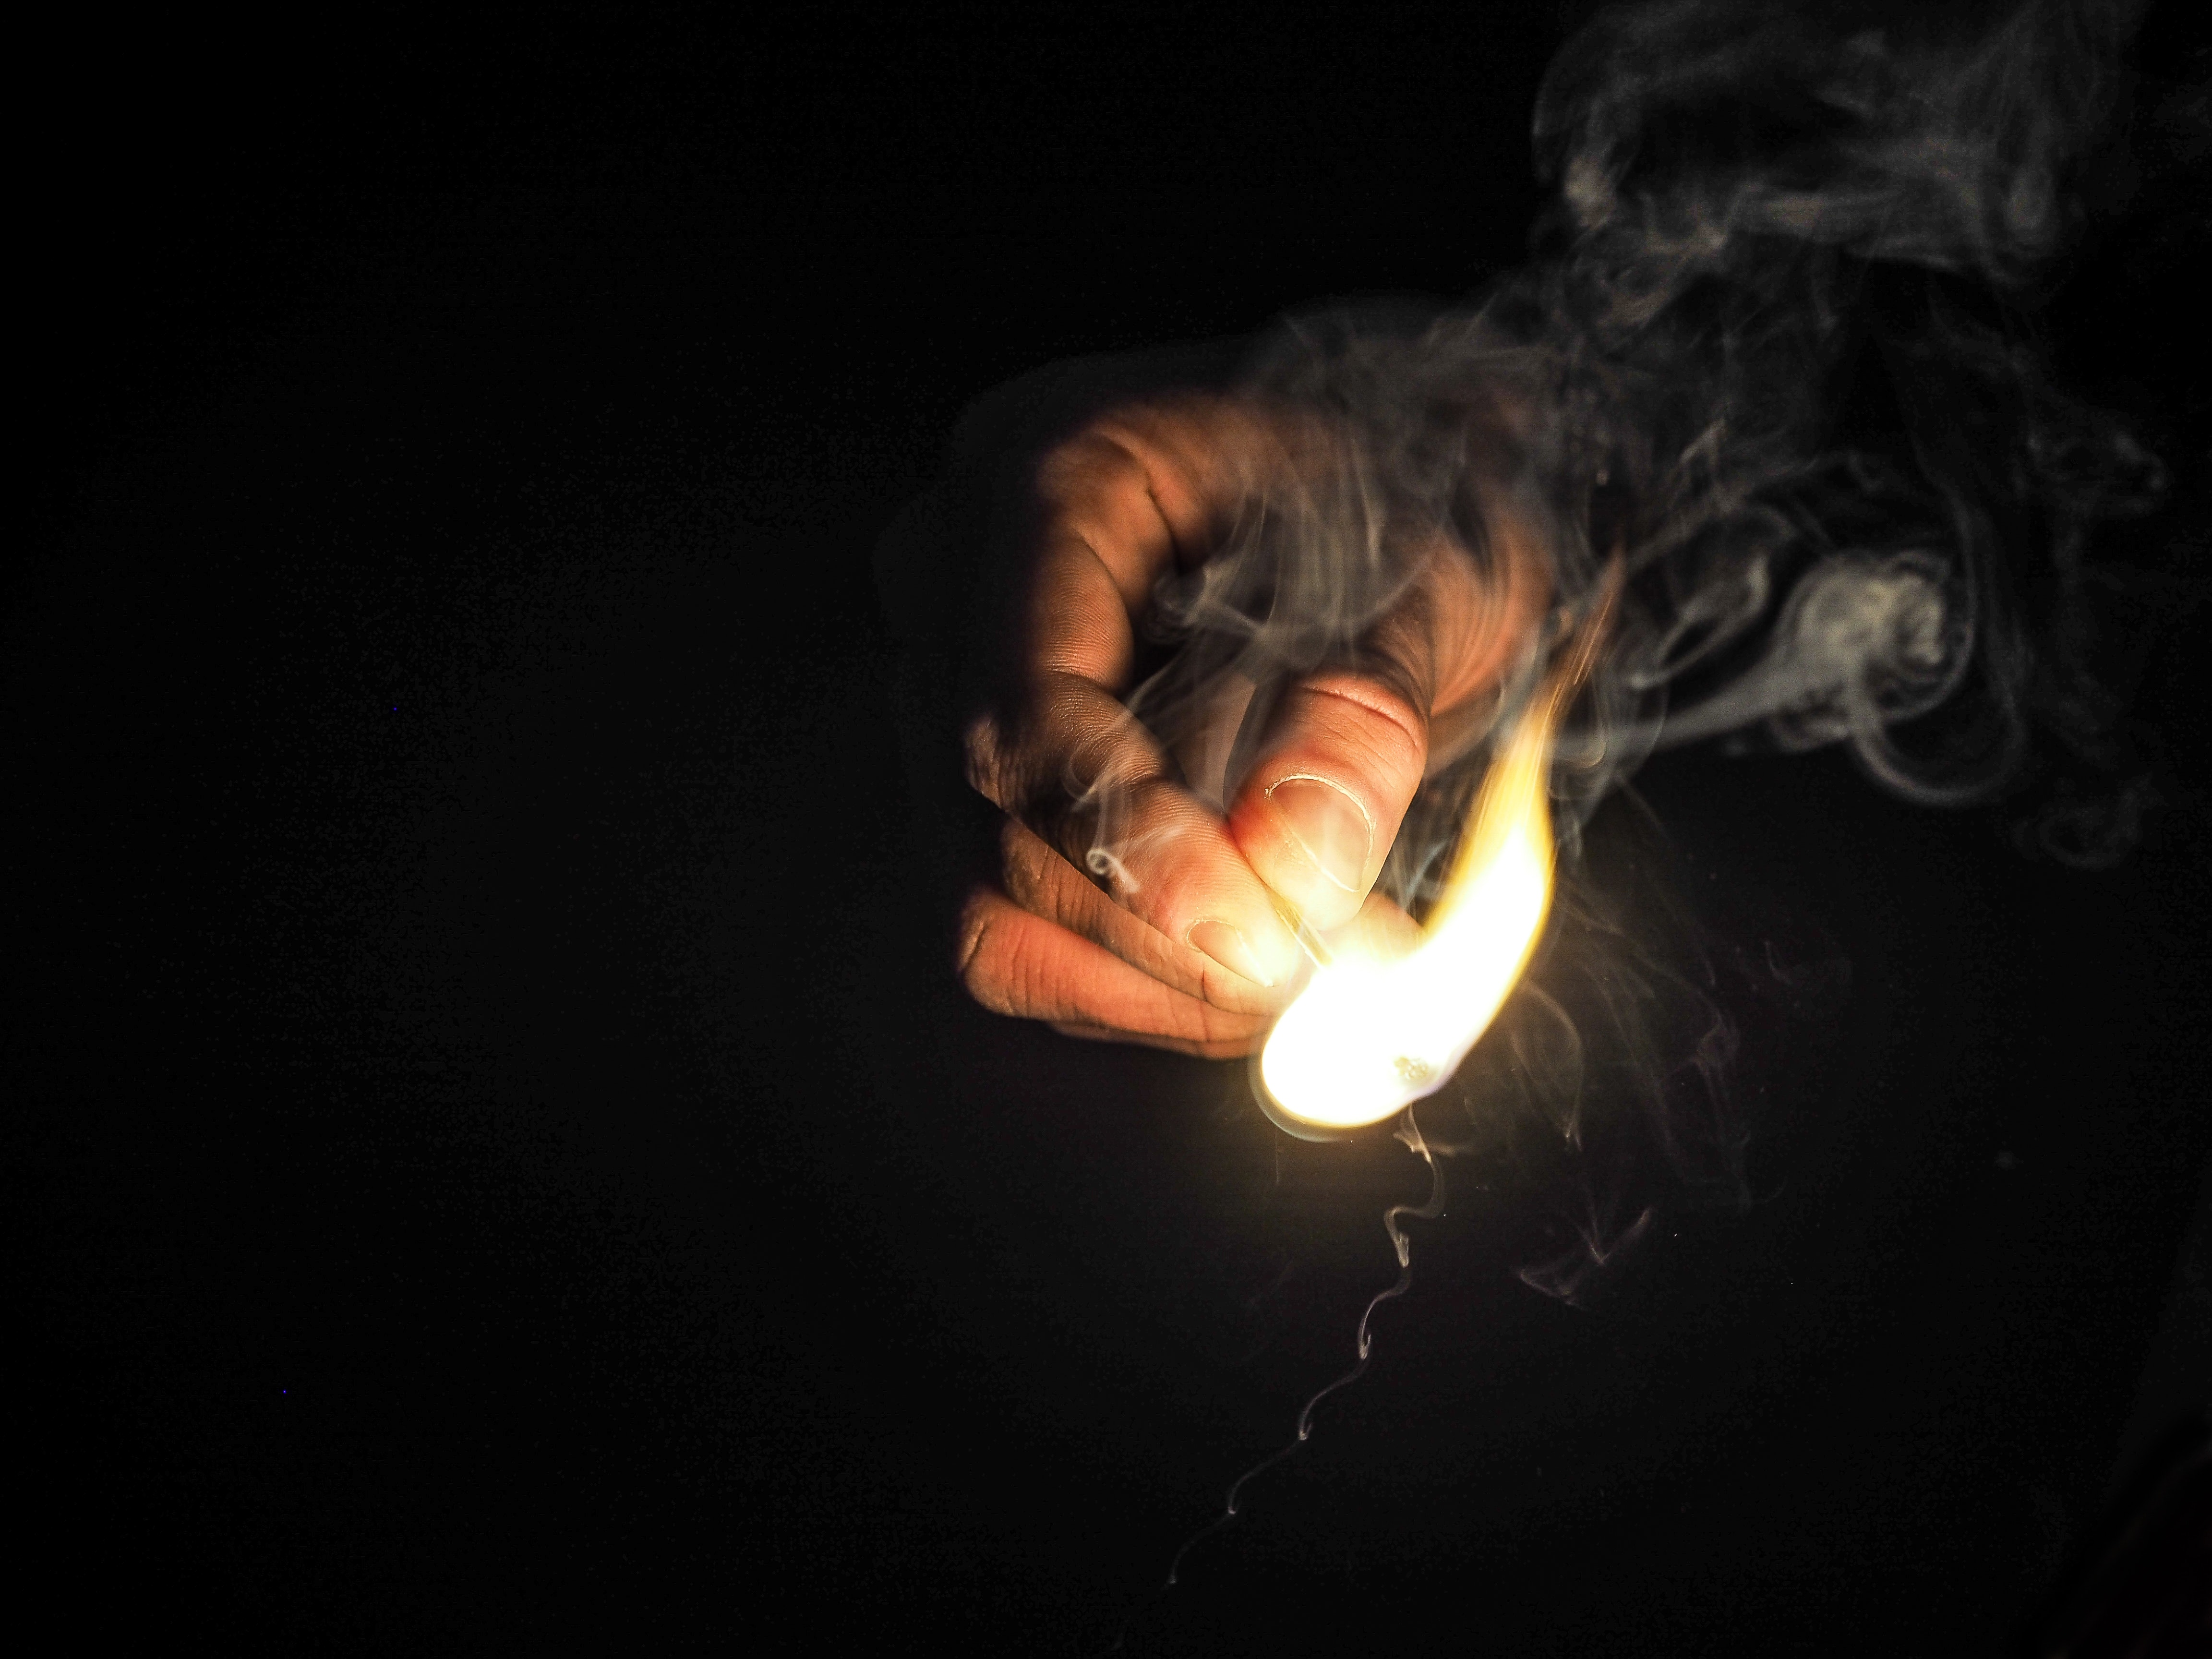 rygende varme leads